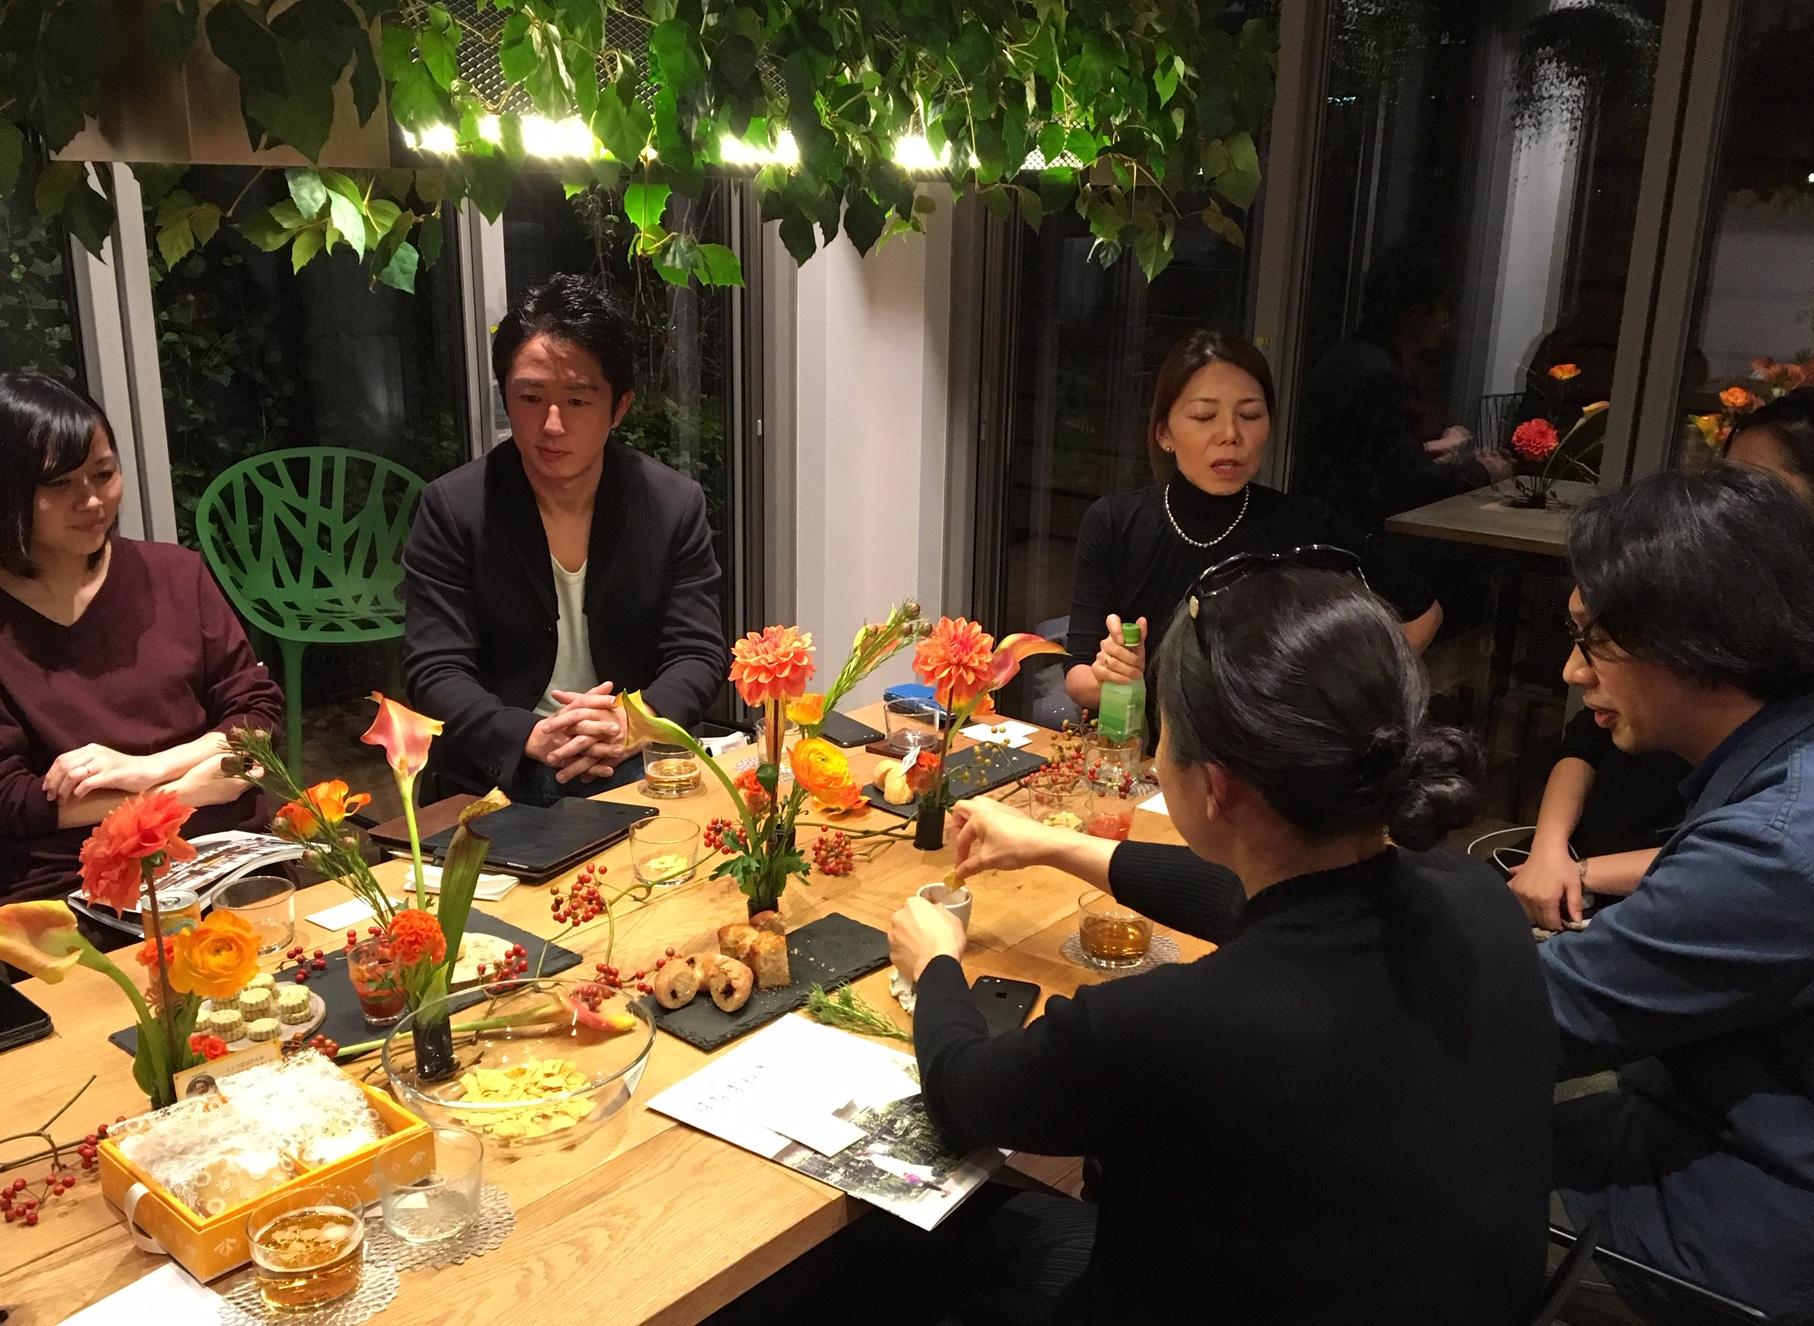 Hanamaneki meeting with architects, flower designers and art coordinator, Tokyo November 2018